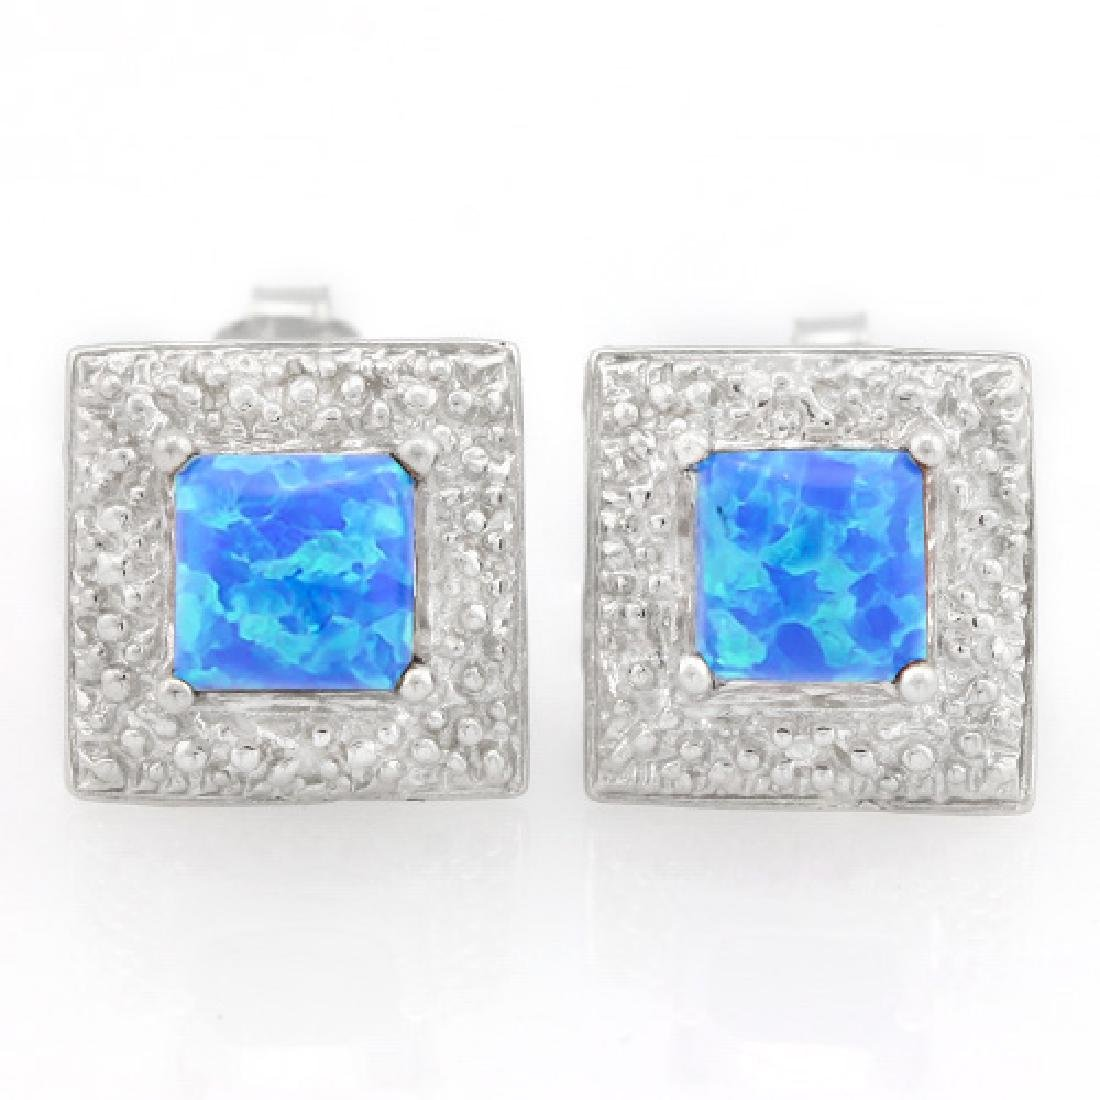 3/5 CARAT CREATED BLUE FIRE OPAL & DIAMOND 925 STERLING